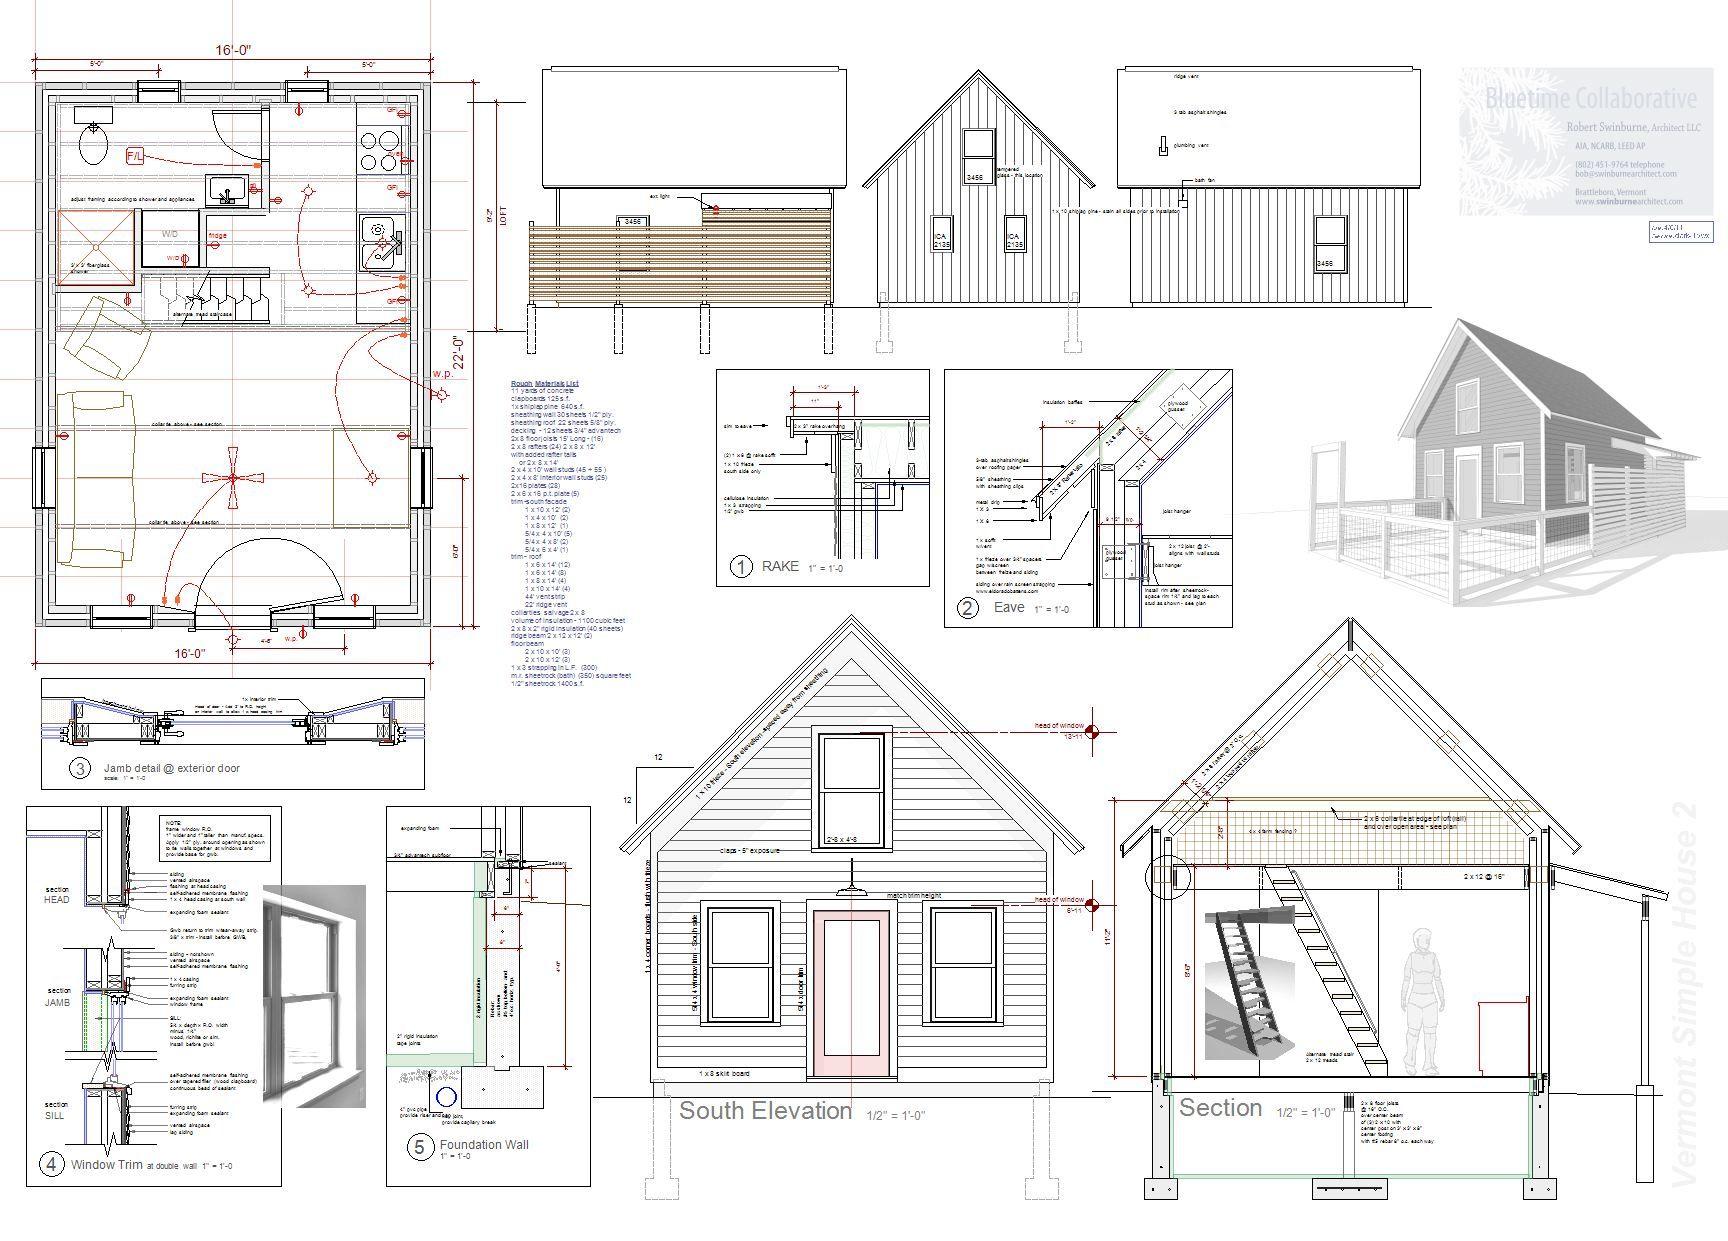 Amazing 17 Best Images About Tiny House Plans Design Ideas On Pinterest Largest Home Design Picture Inspirations Pitcheantrous